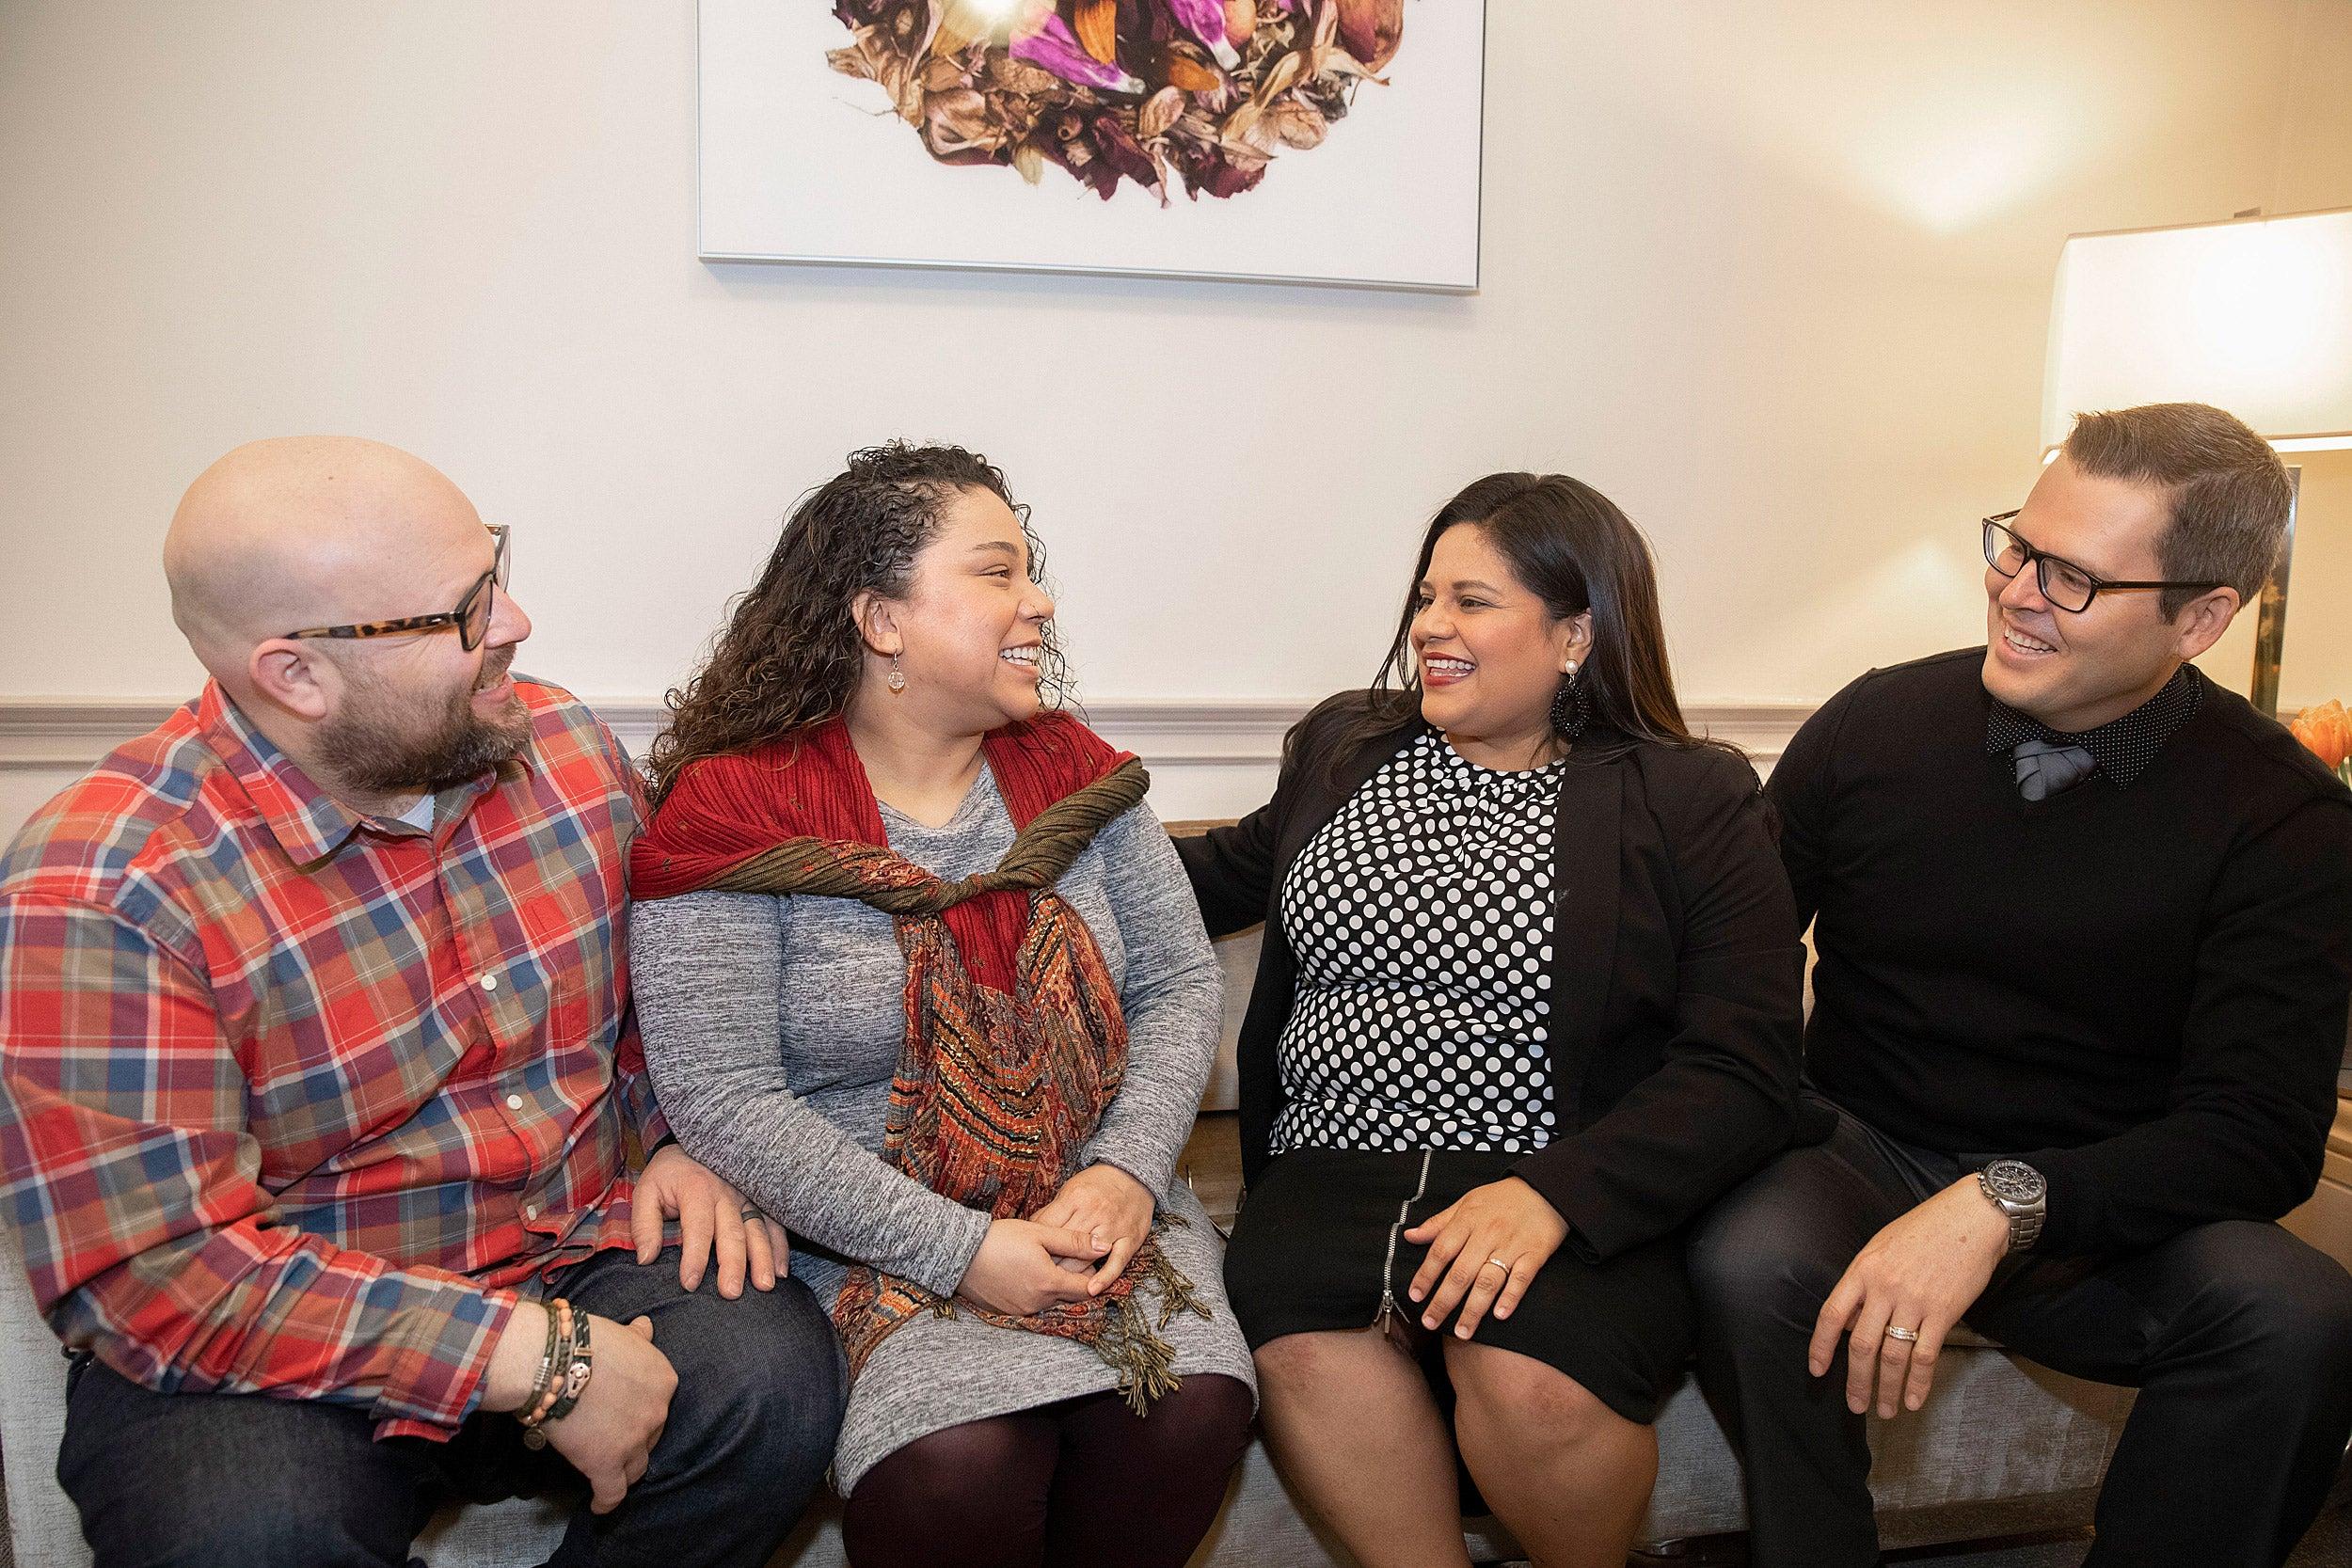 Sonia Gomez and Marlon Gomez and Marla Ramirez and Molina Ruano.